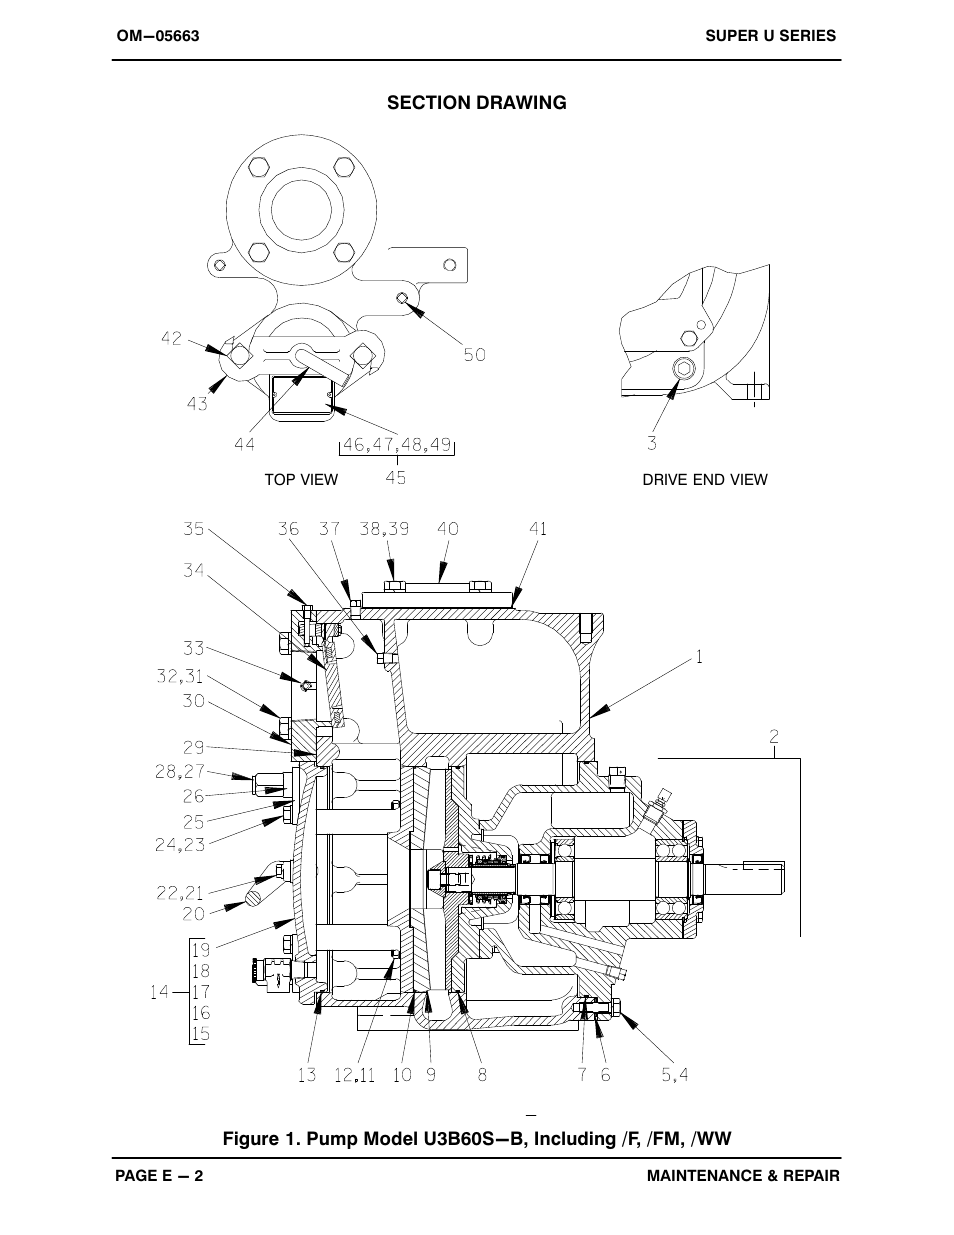 Gorman-Rupp Pumps U3B60S-B 1289509 and up User Manual